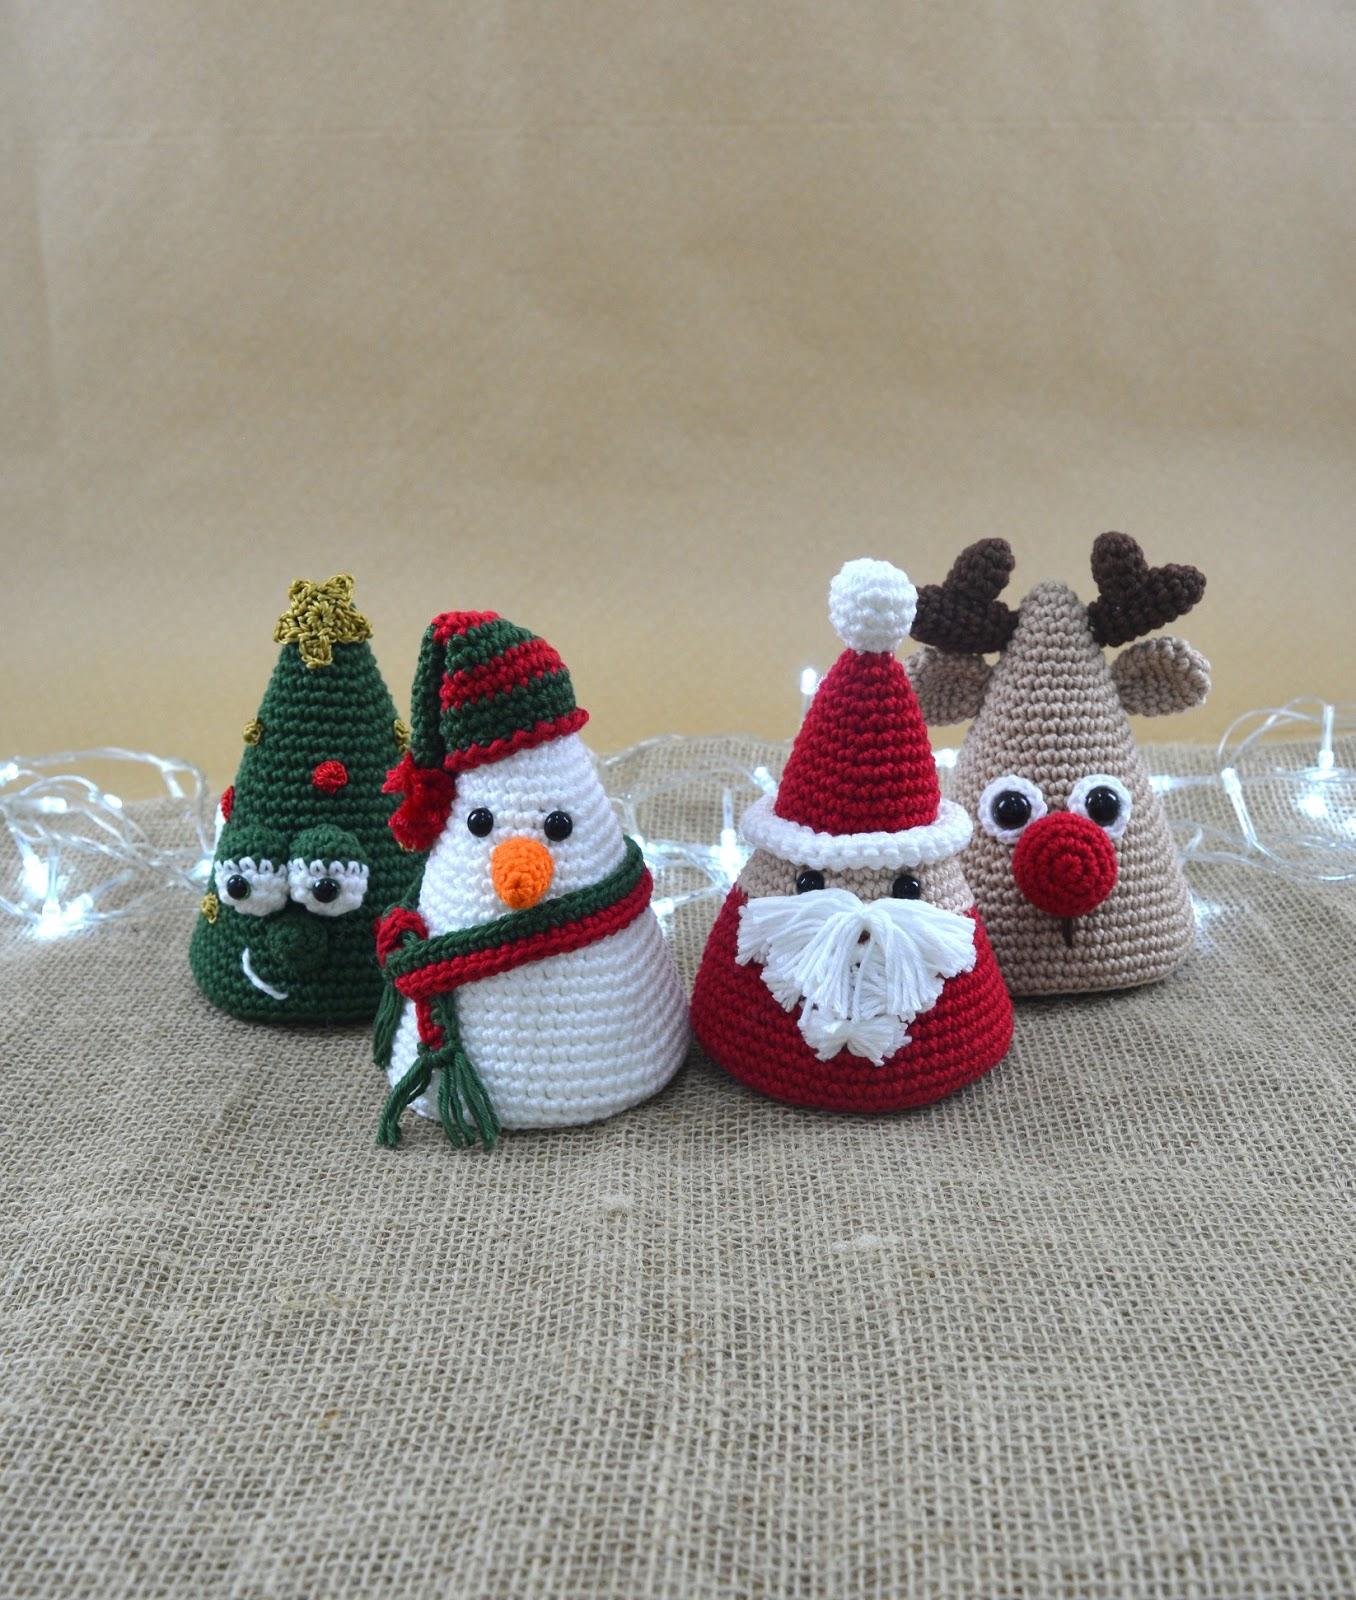 5 receitas grátis de amigurumi de Natal - Receitas de crochê ...   1600x1356